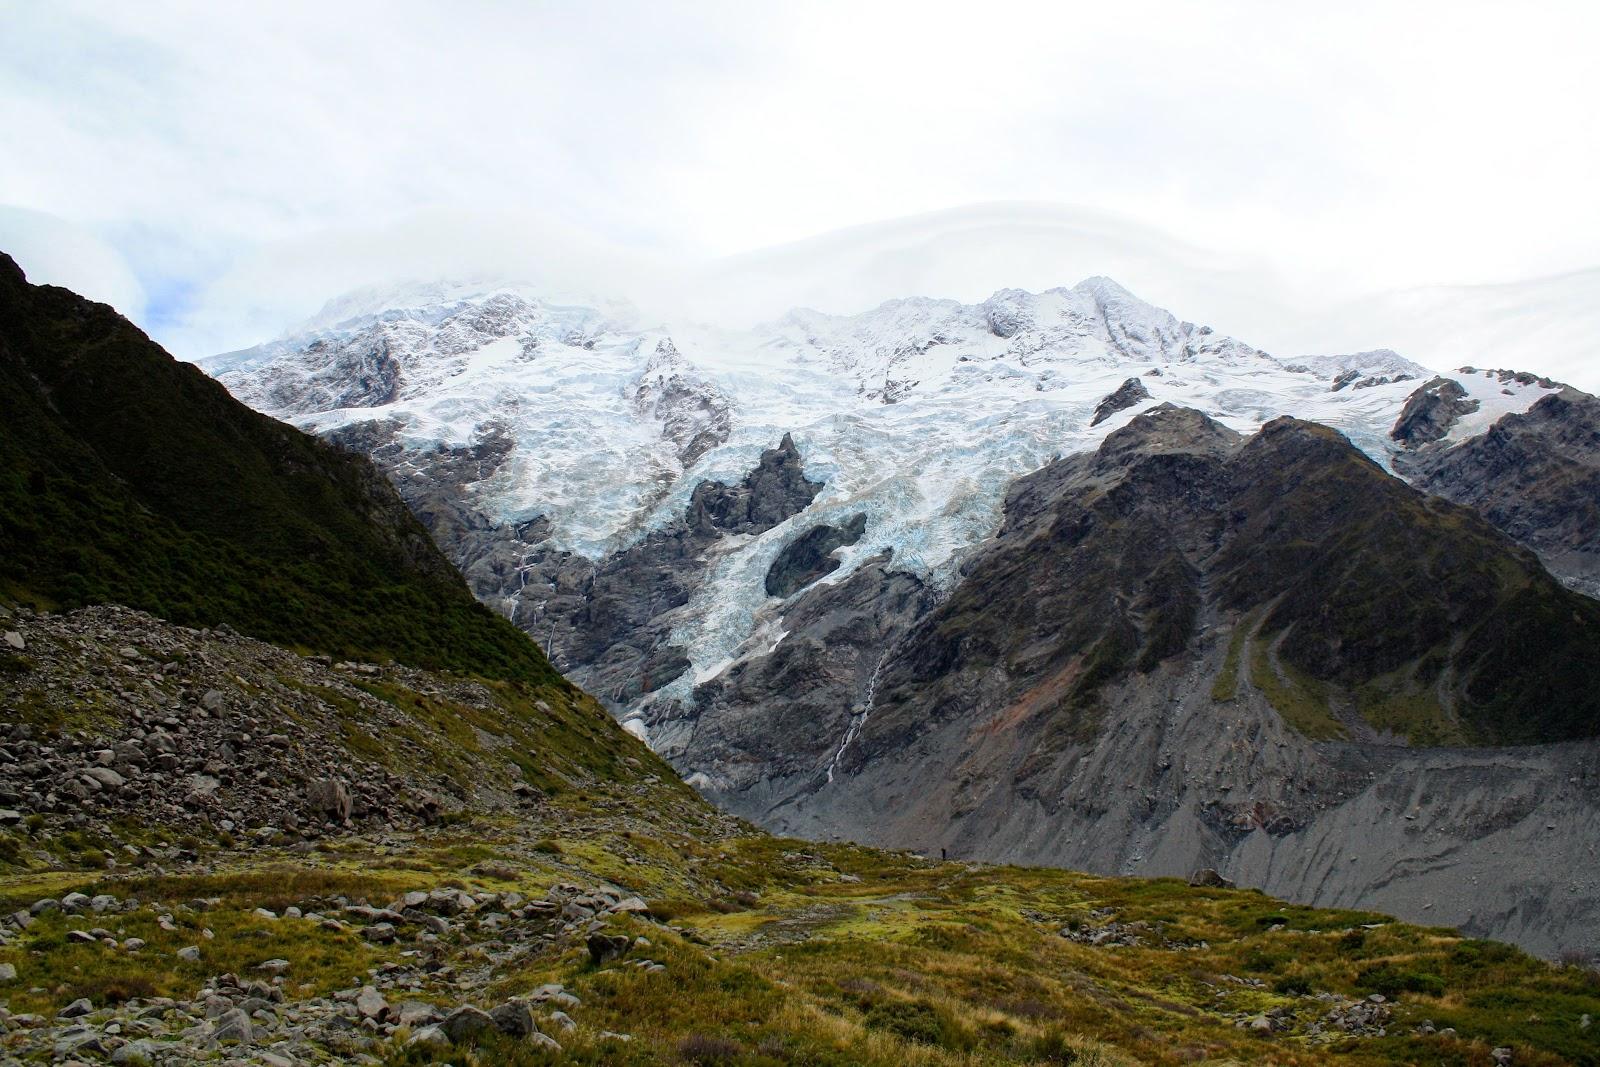 That's a glacier.